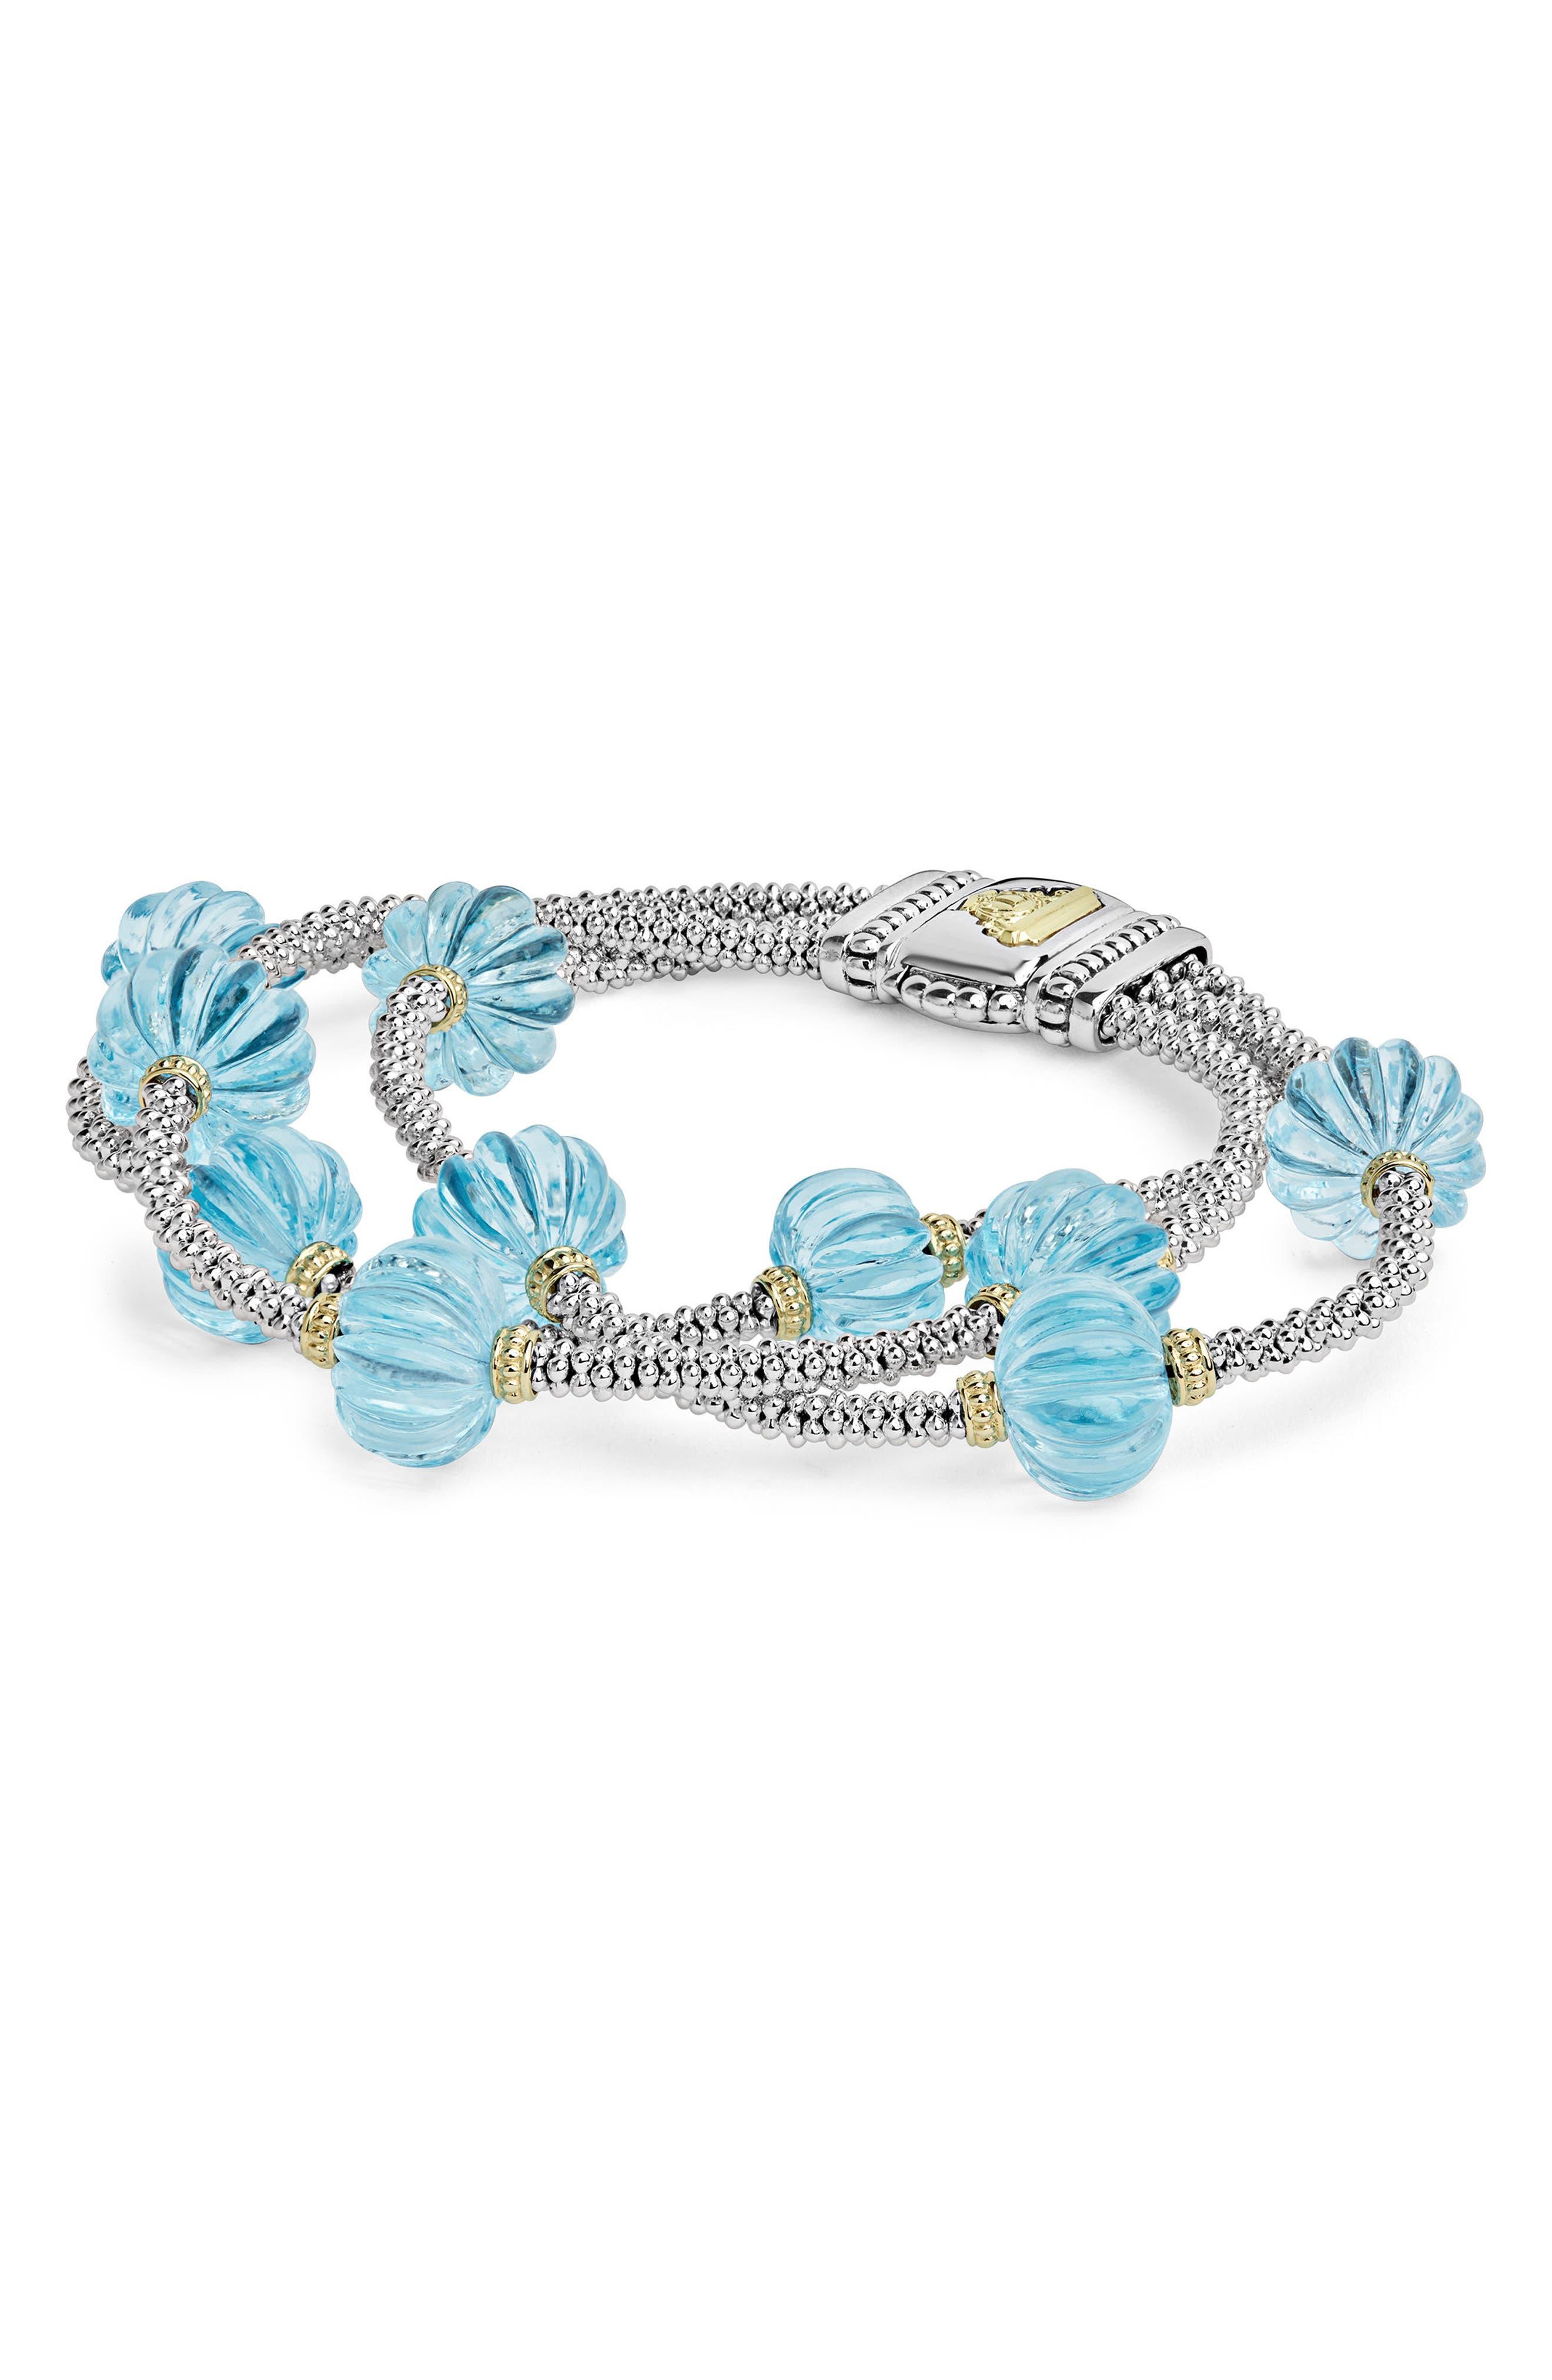 Caviar Forever Triple Strand Melon Bead Bracelet,                             Alternate thumbnail 2, color,                             Silver/ Sky Blue Topaz